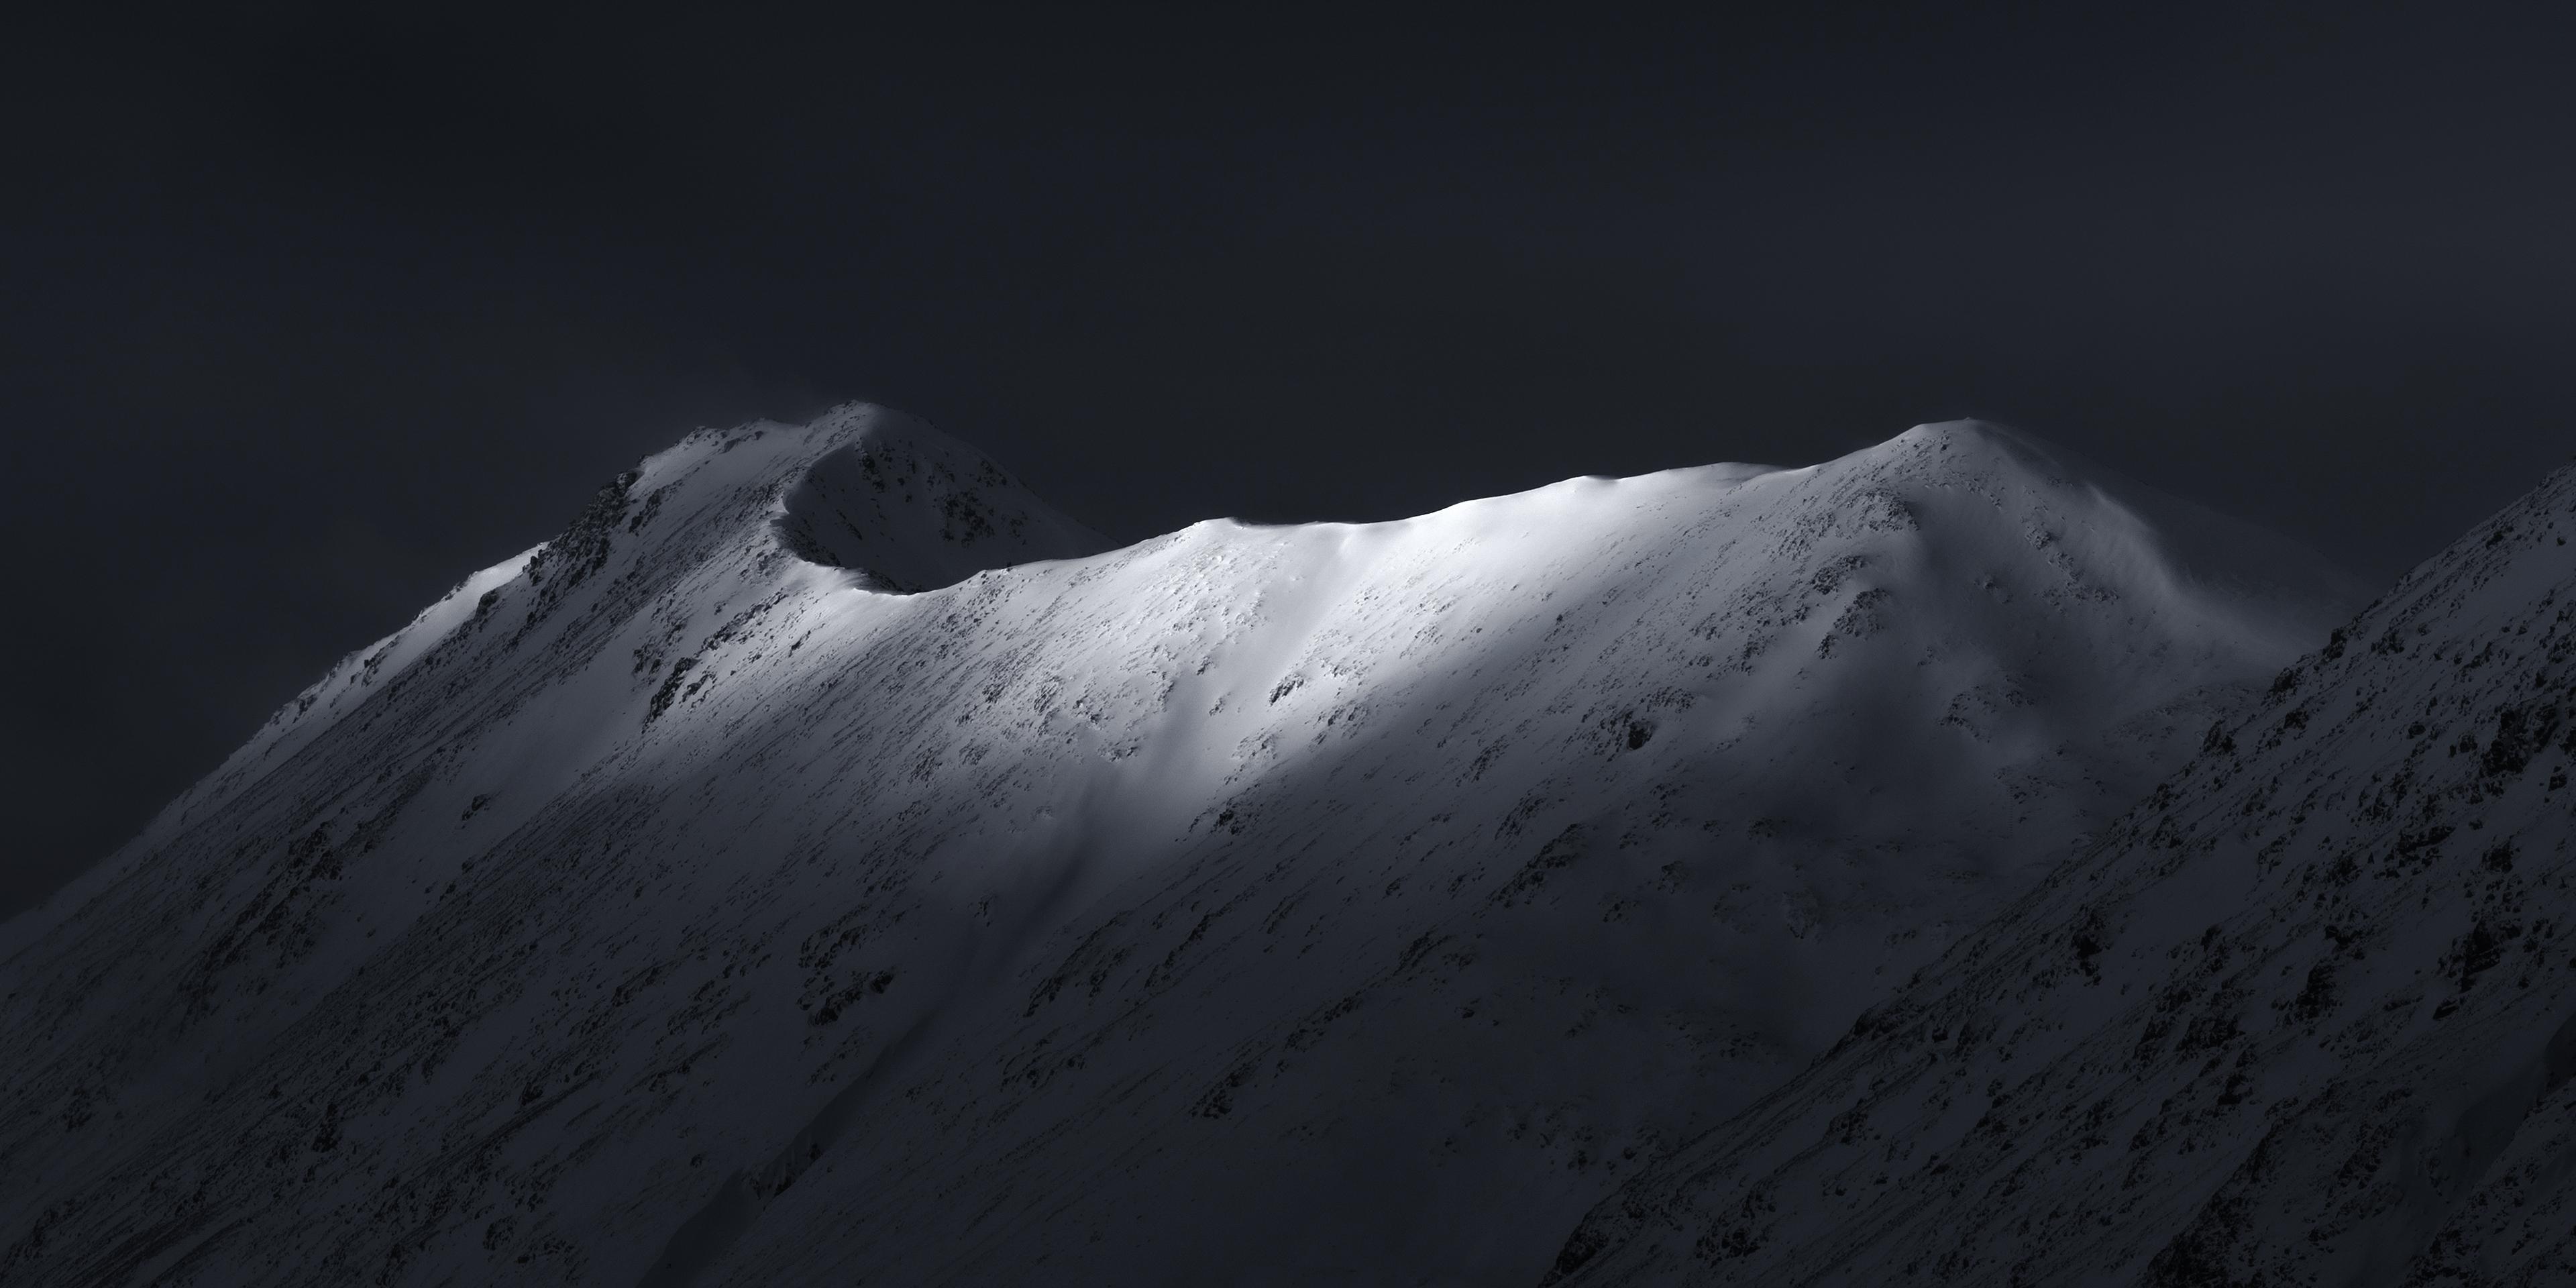 dark night mountains 4k 1602606095 - Dark Night Mountains 4k - Dark Night Mountains 4k wallpapers